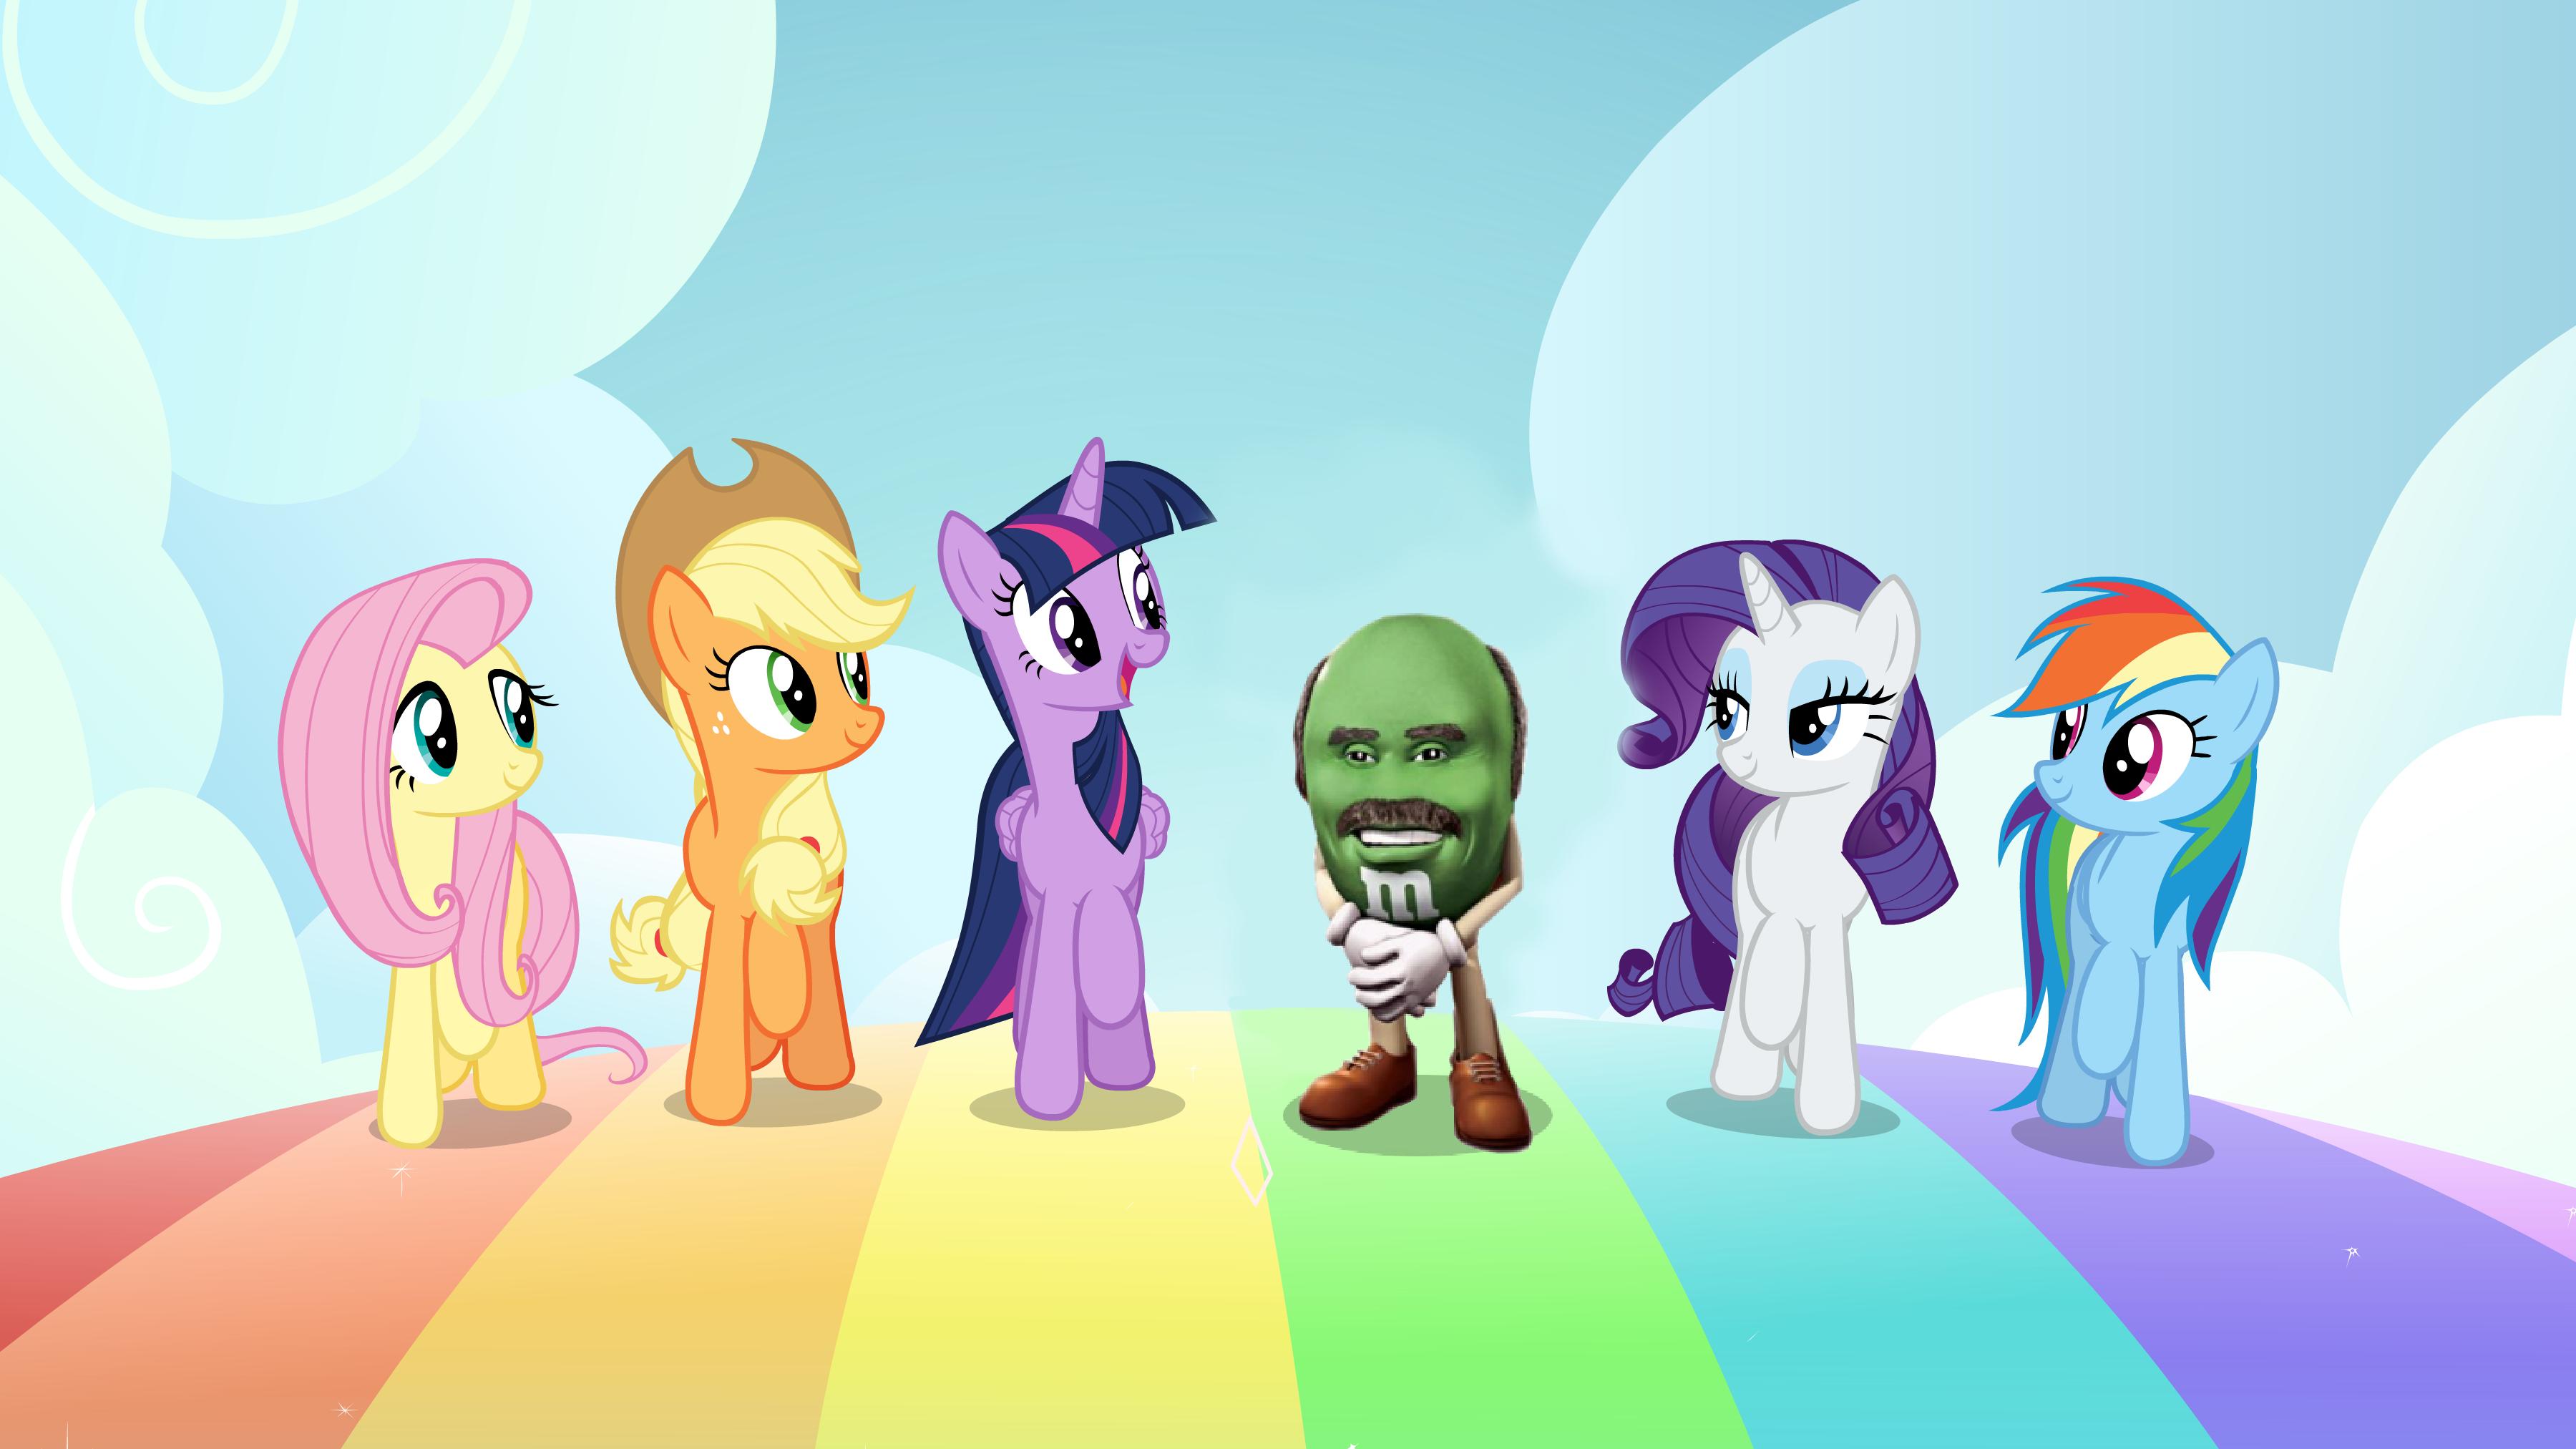 O  m , my little pony 1547316__safe_artist-colon-reichmaster_edit_edited+screencap_screencap_applejack_fluttershy_pinkie+pie_rainbow+dash_rarity_twilight+sparkle_alicorn_bes